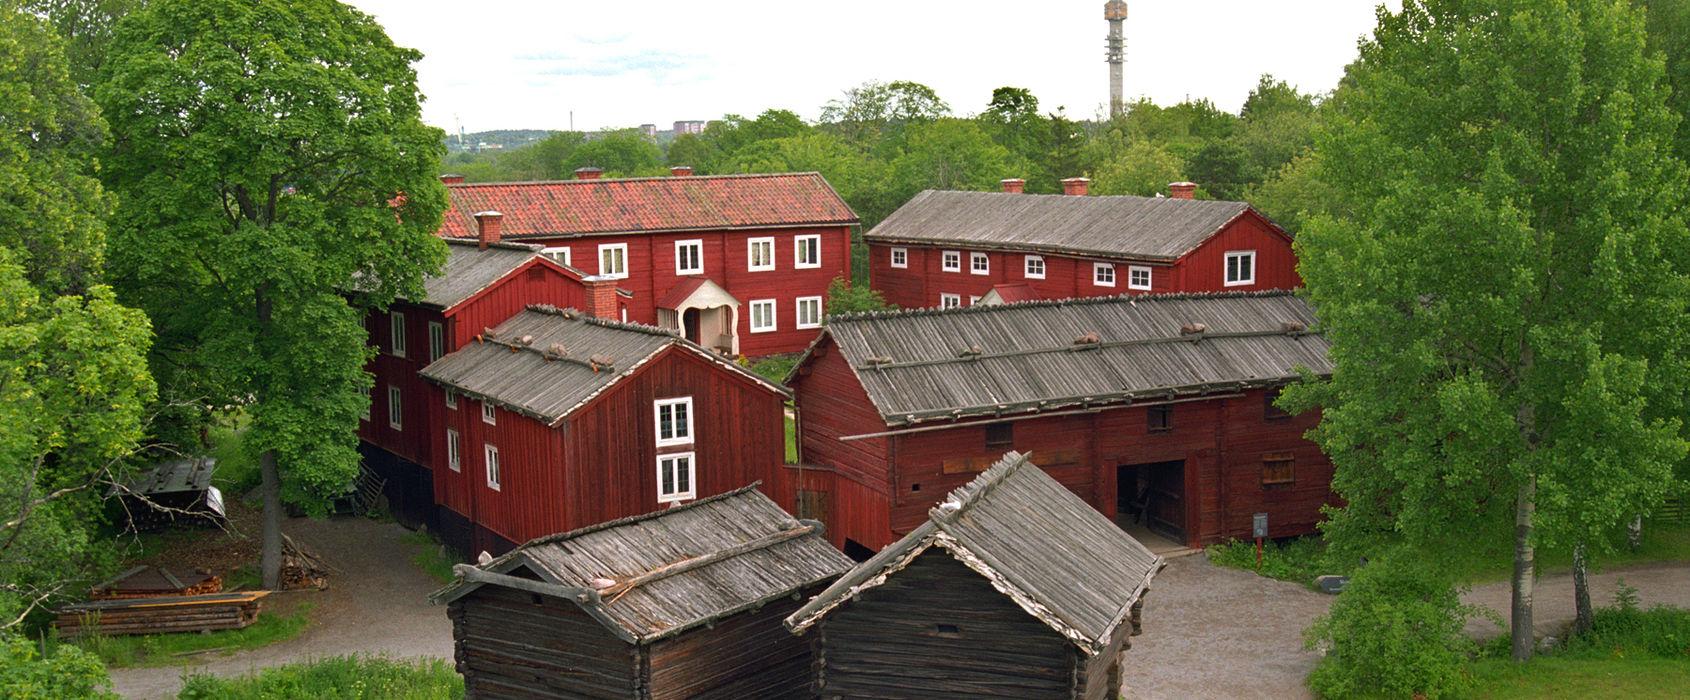 Delsbogården - flygfoto